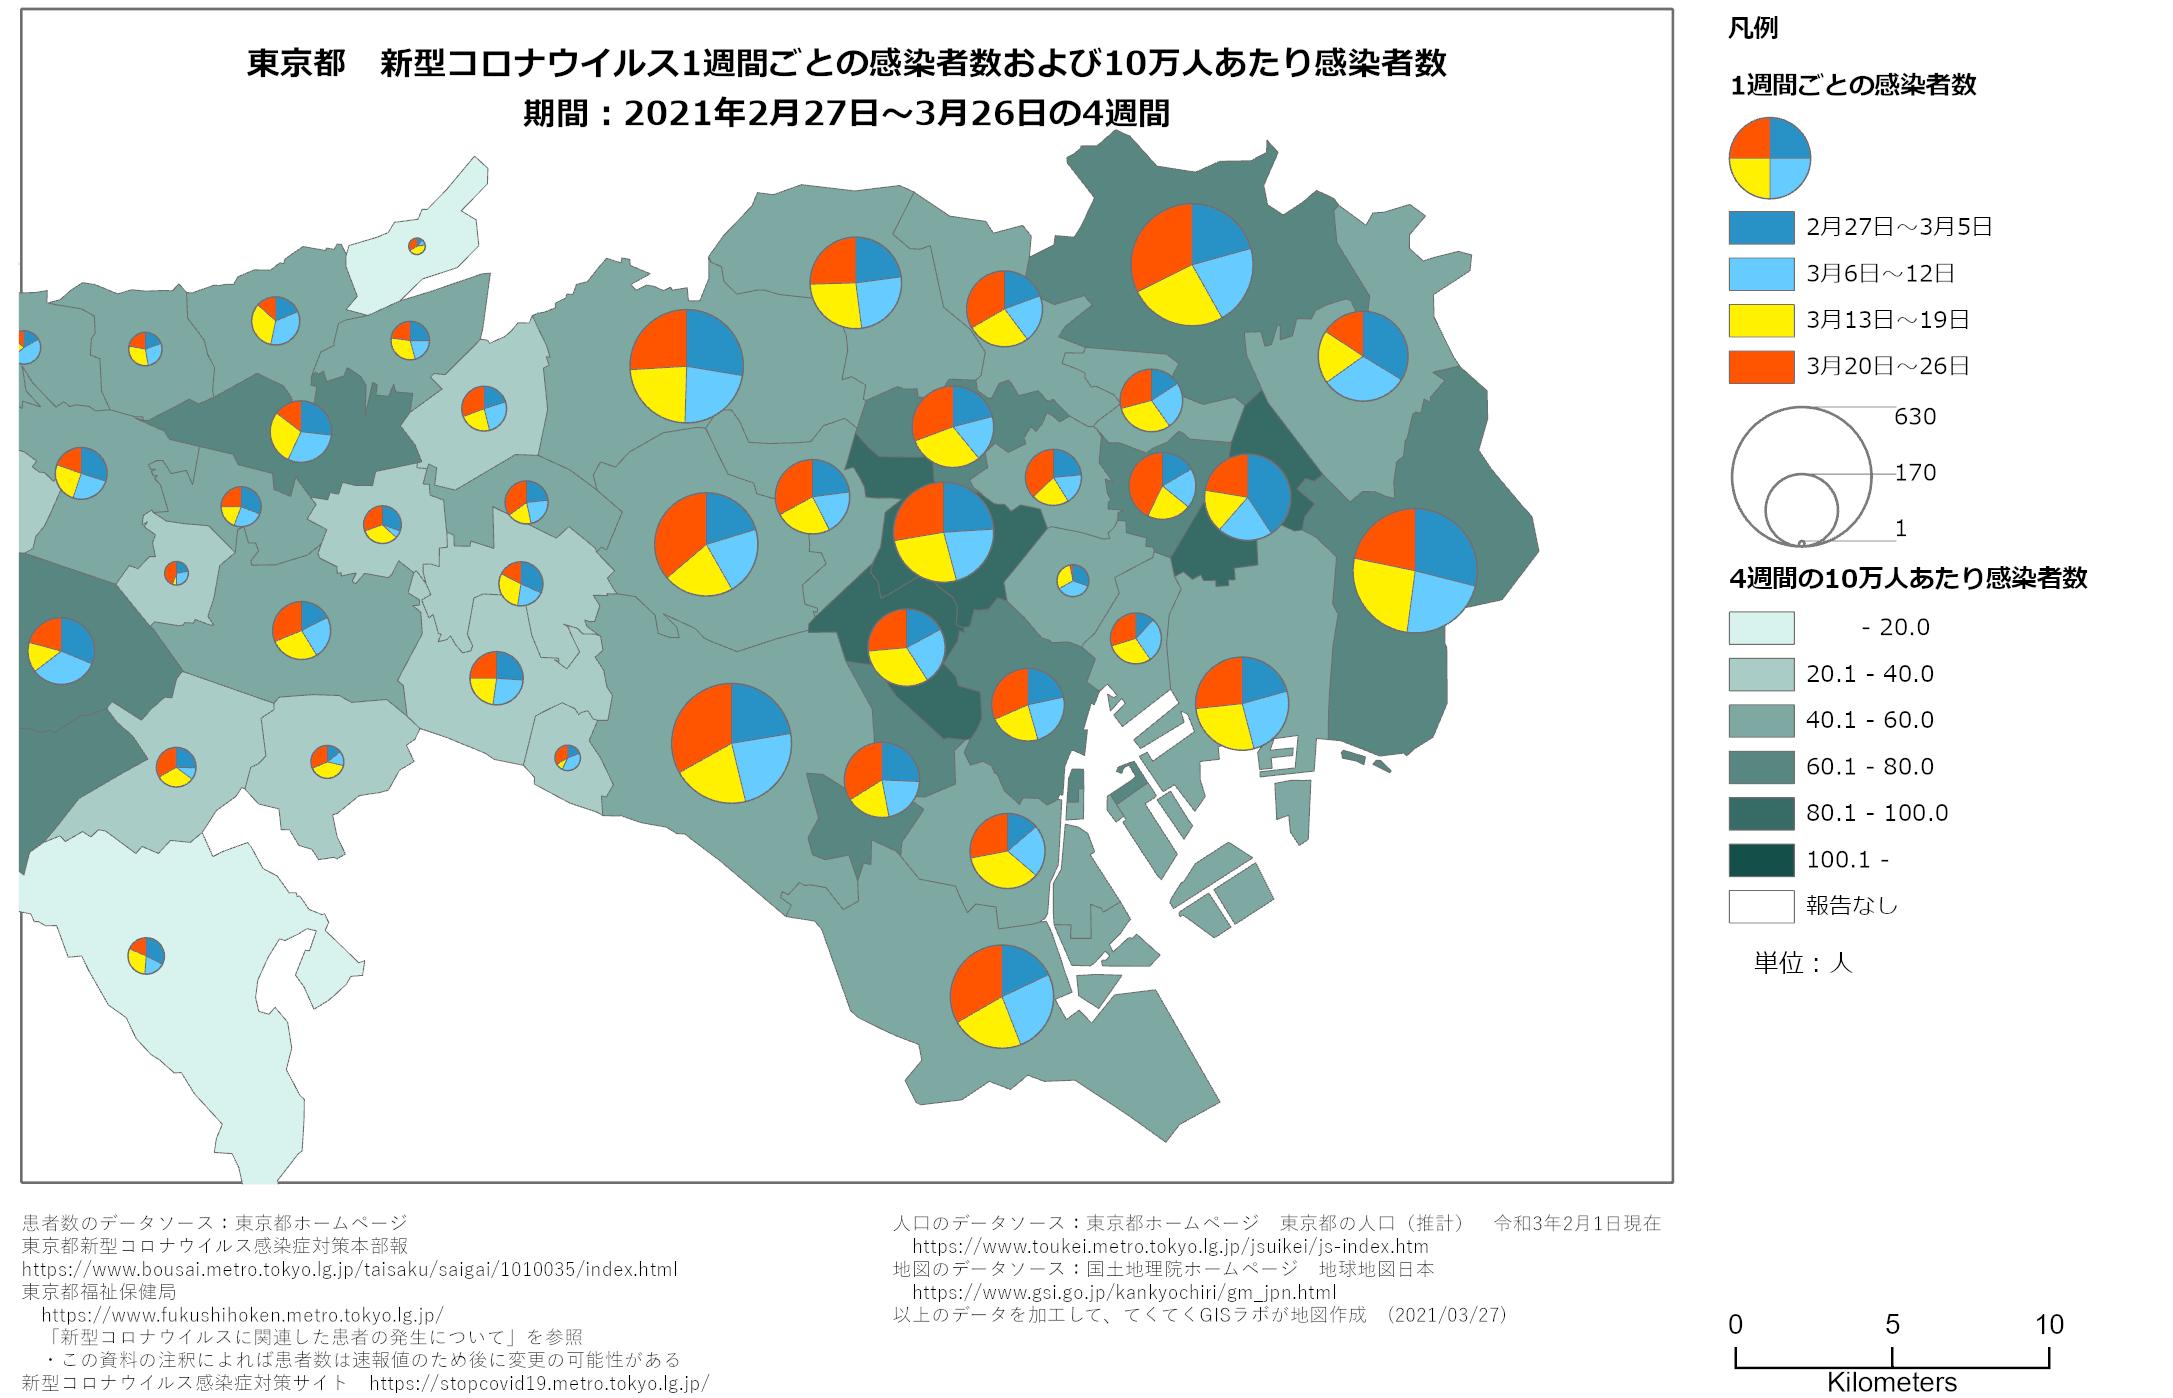 1週間ごと感染者数、東京都、2月27日〜3月26日